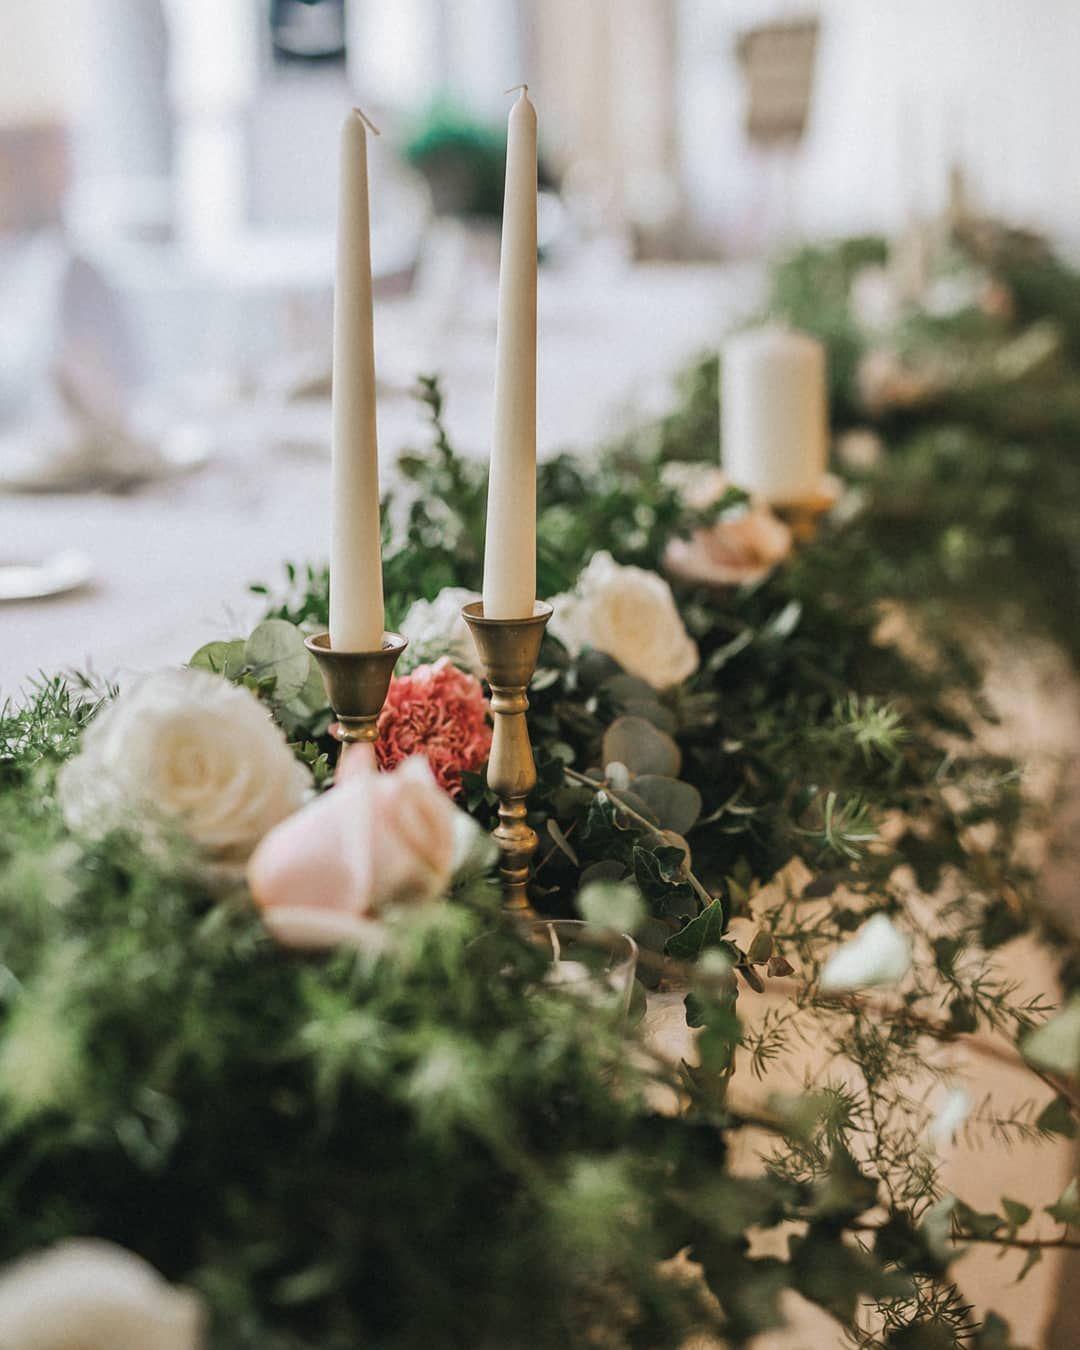 Cvit Happens Weddingtable Wedding Table Wedding Trends Candles